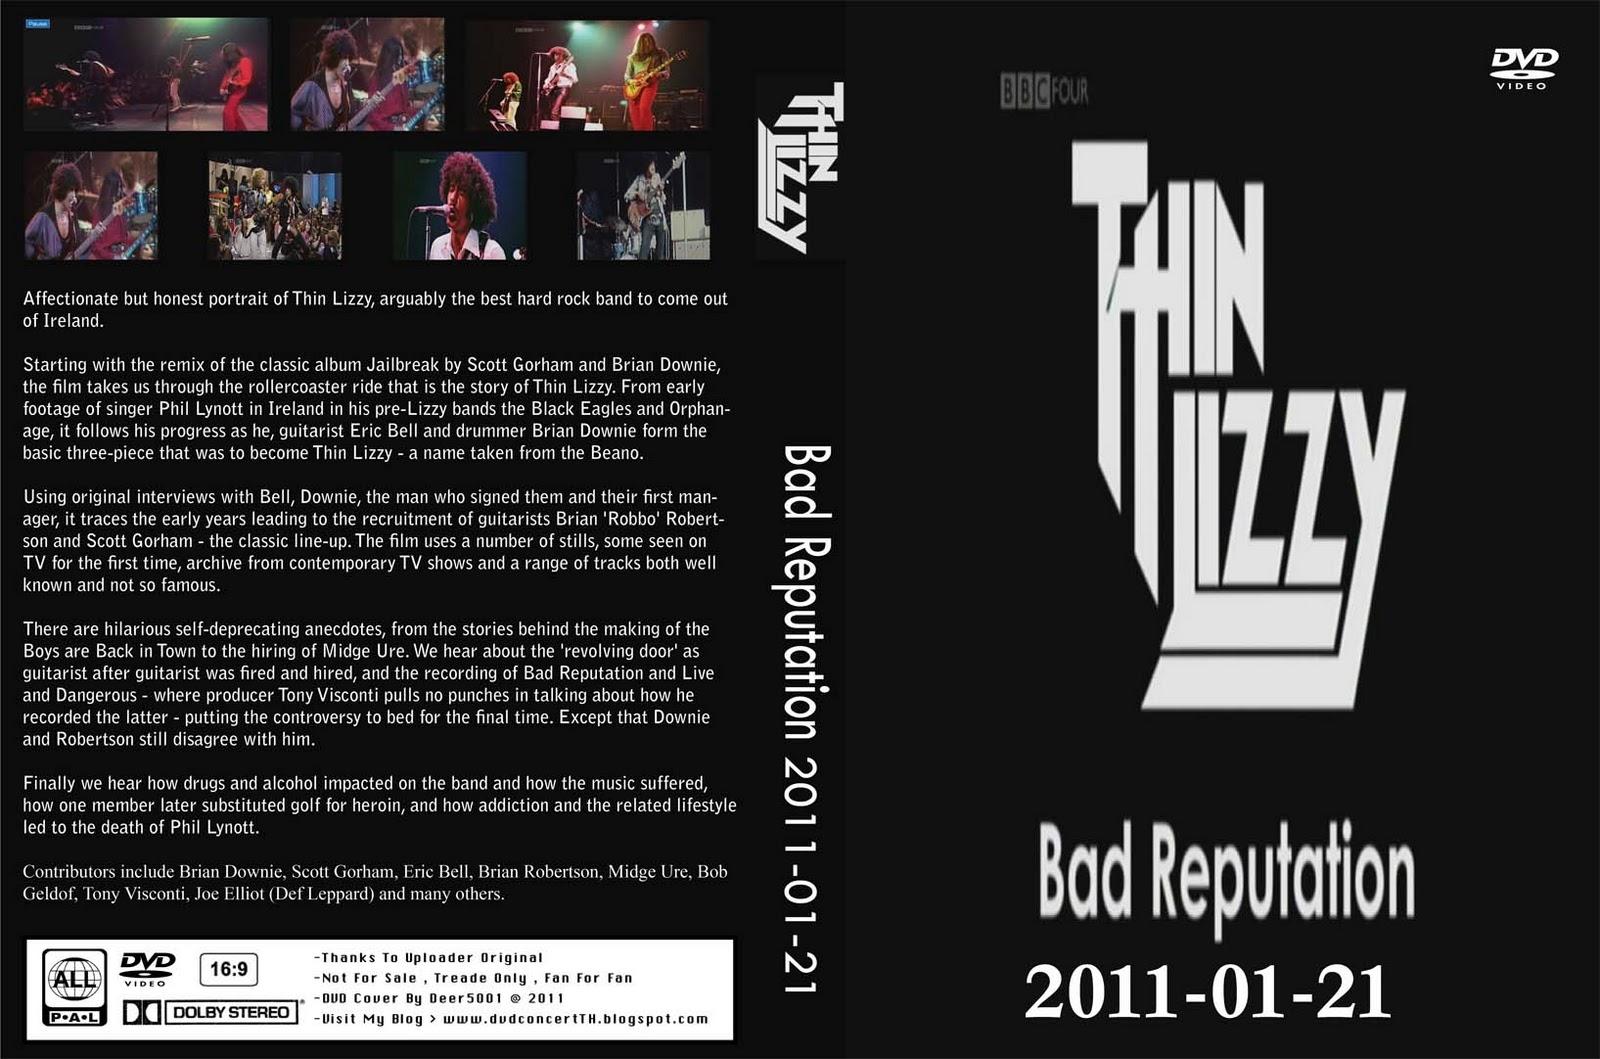 Thin lizzy - bad reputation - 01-21-2011